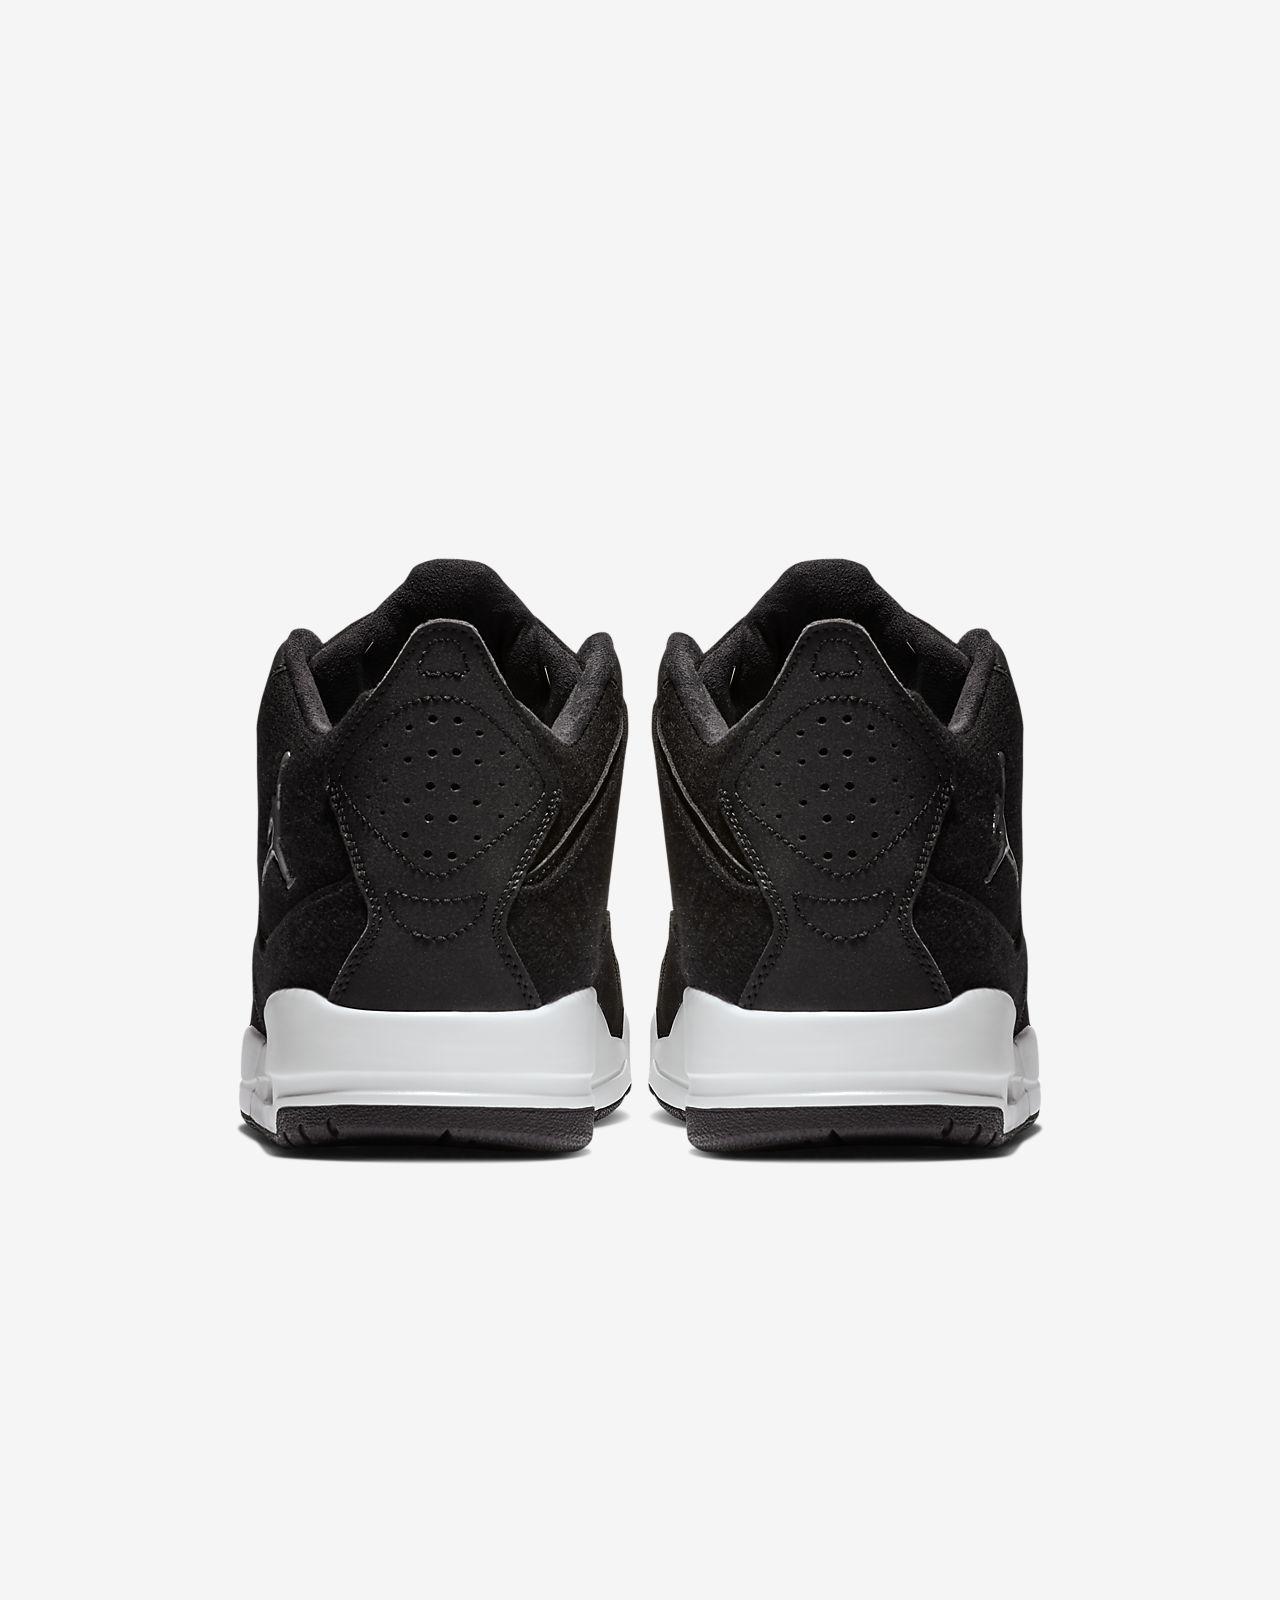 NIKE JORDAN COURTSIDE 23 Herren Herrenschuhe Sneaker